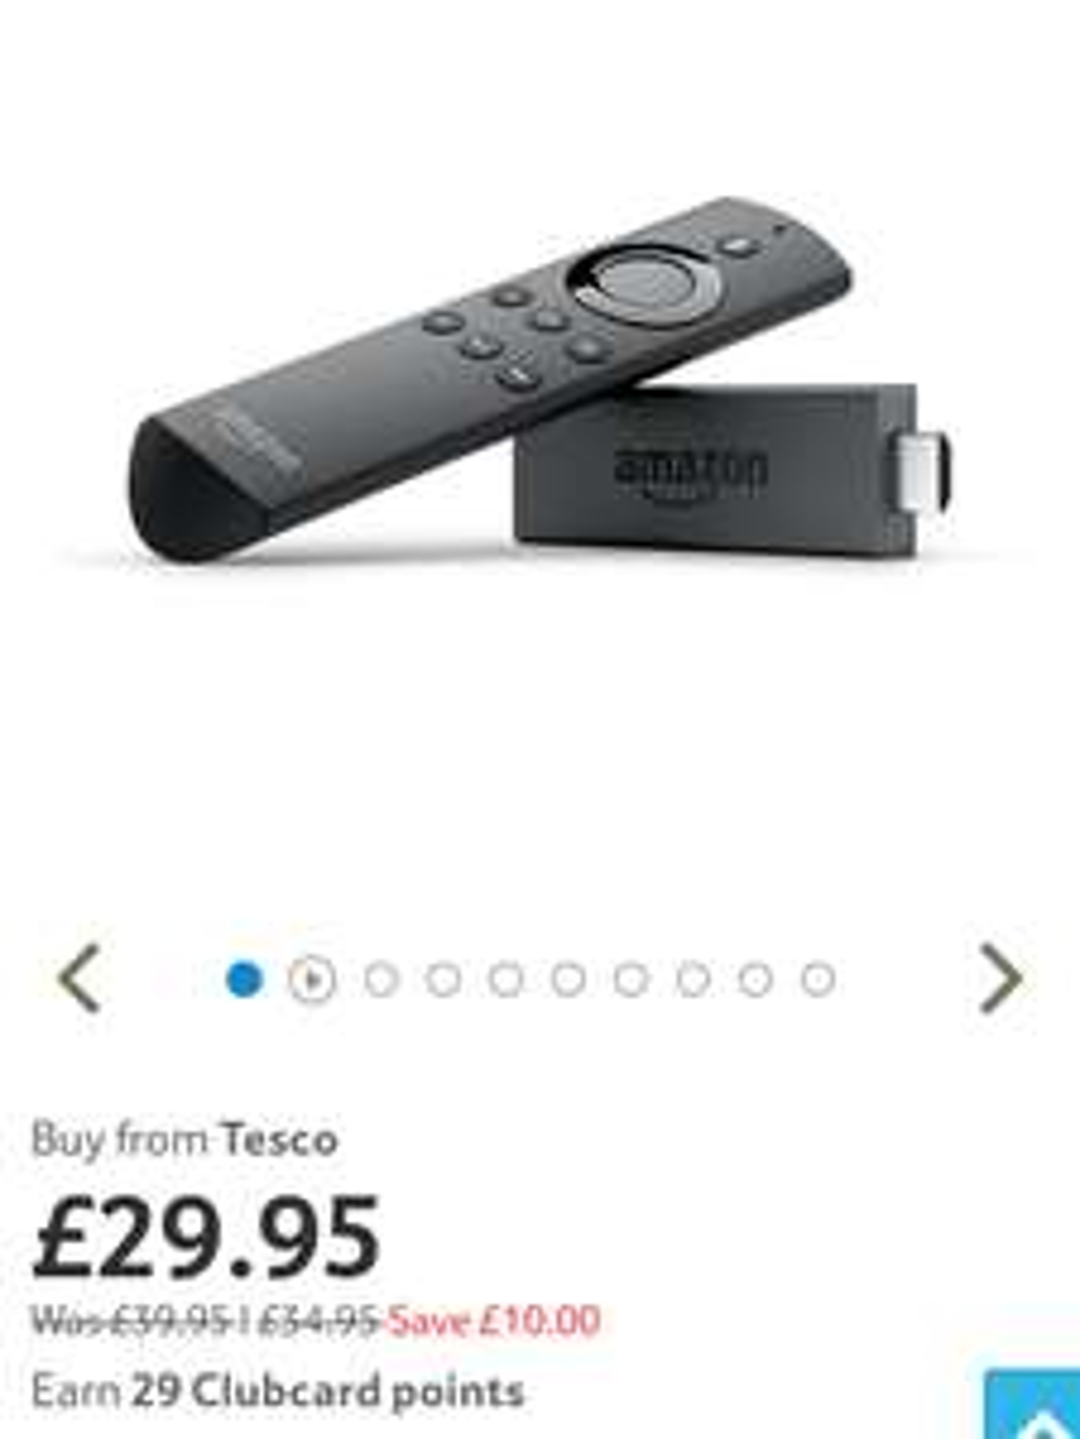 Amazon Fire TV Stick - £29.95 @ Tesco